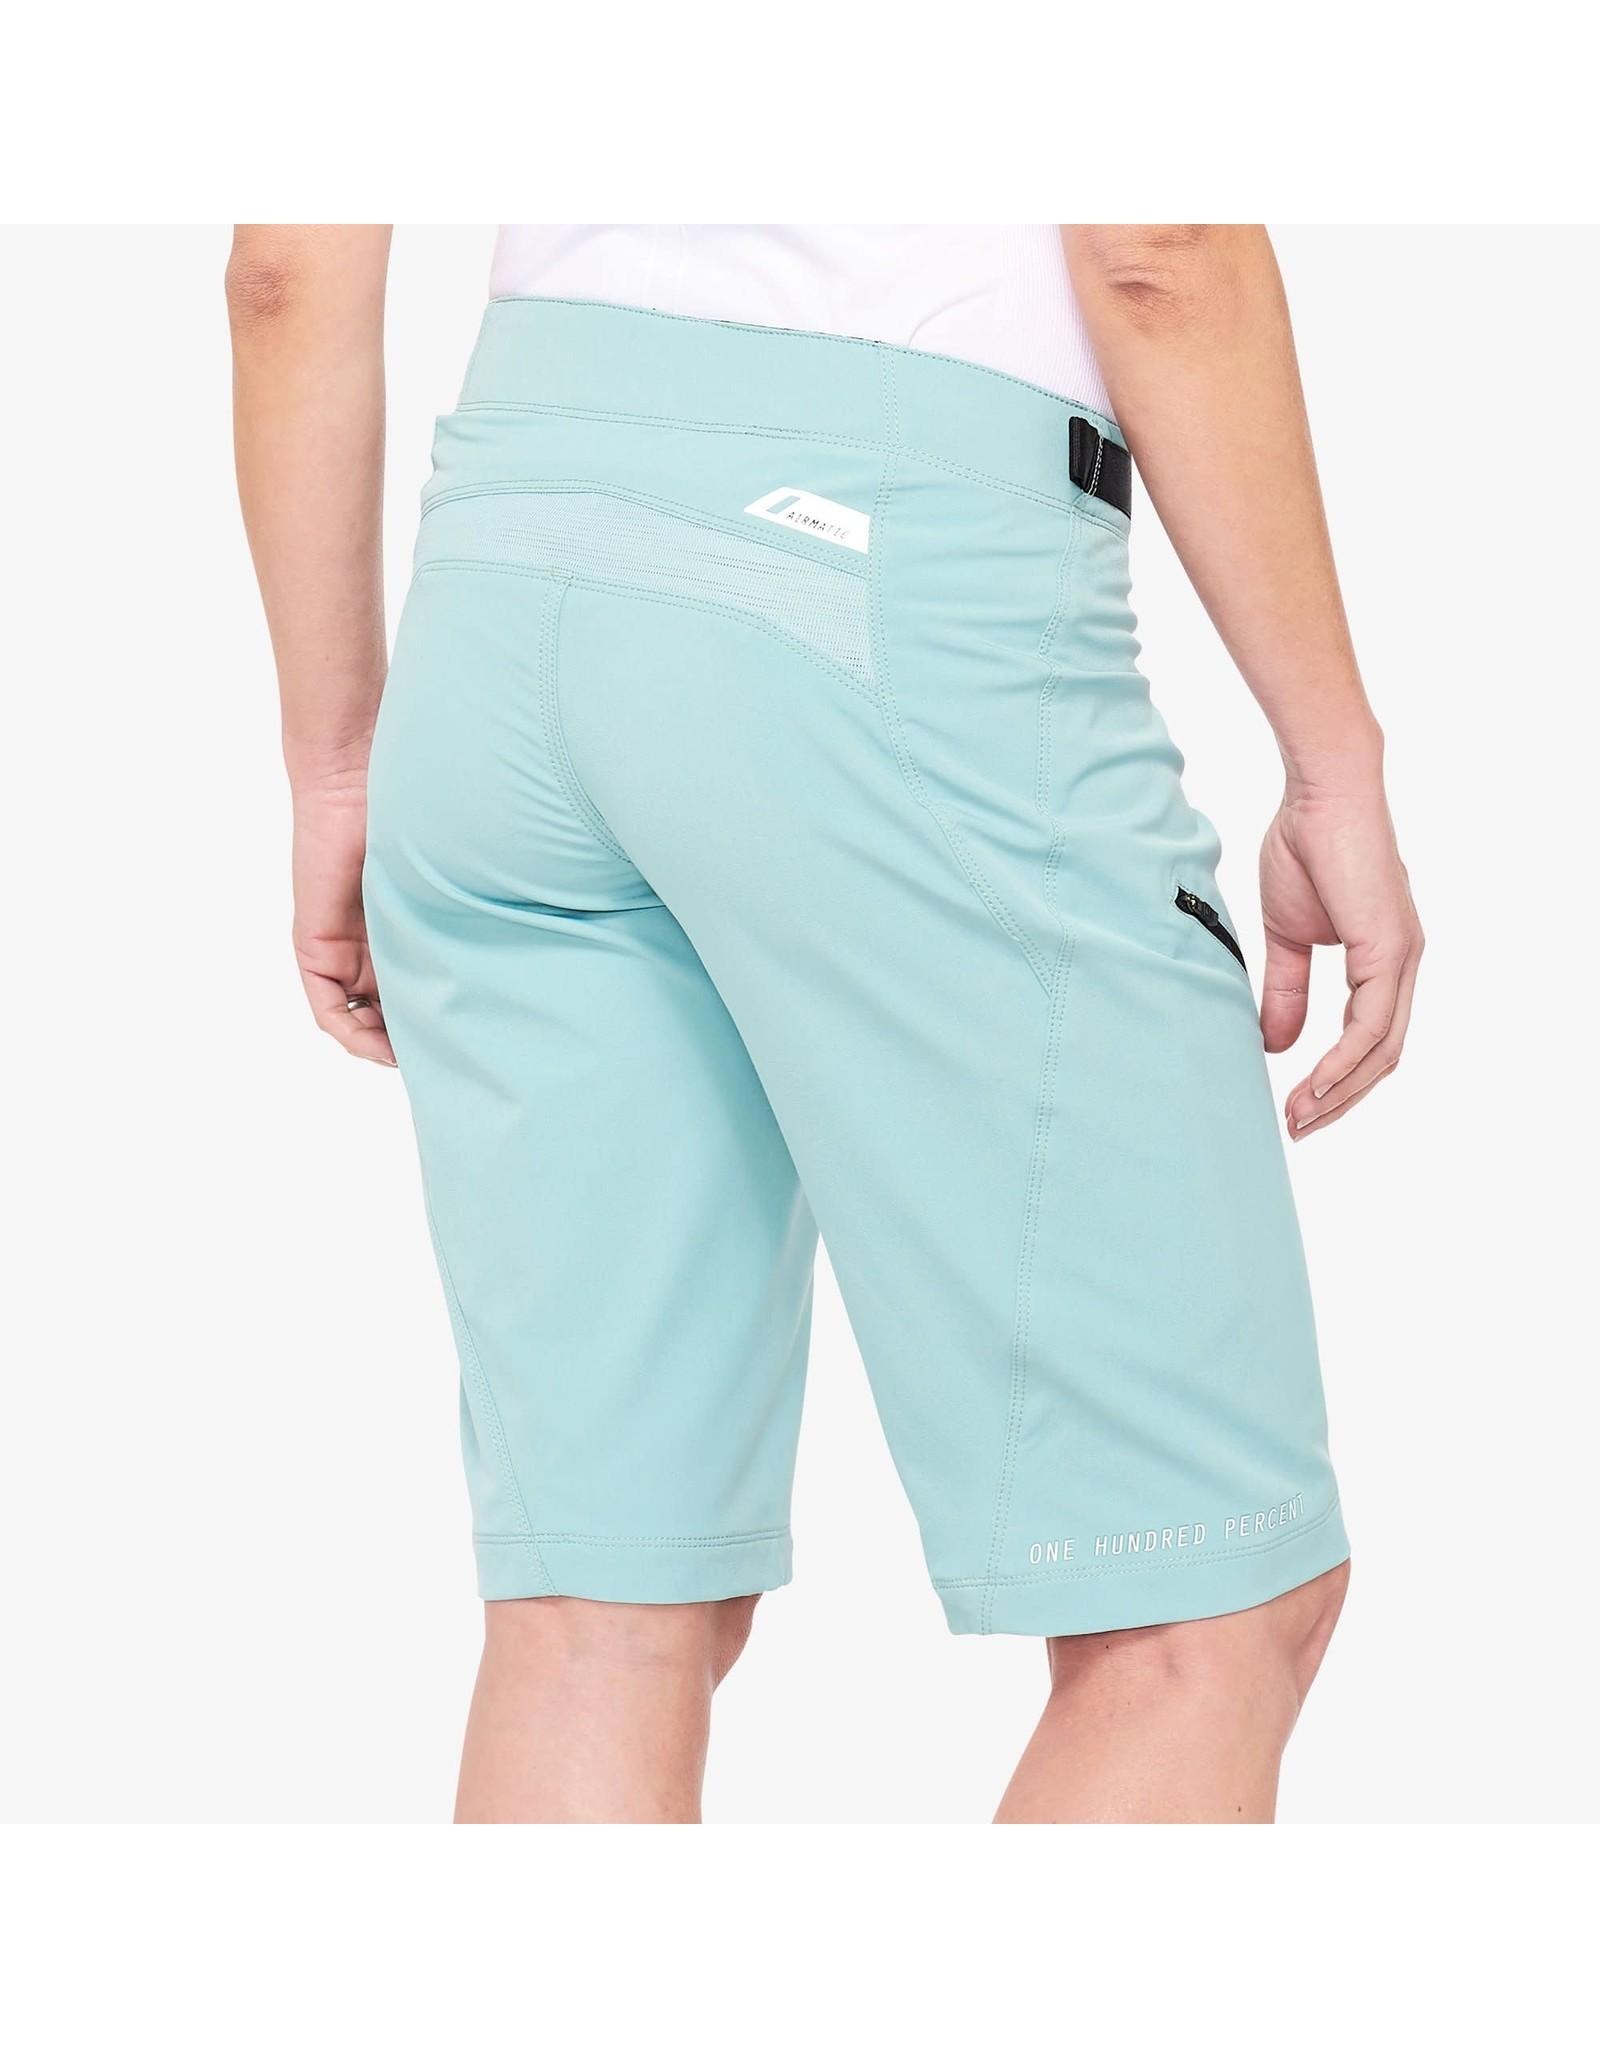 100% 100% - AIRMATIC Women's Shorts Seafoam - S